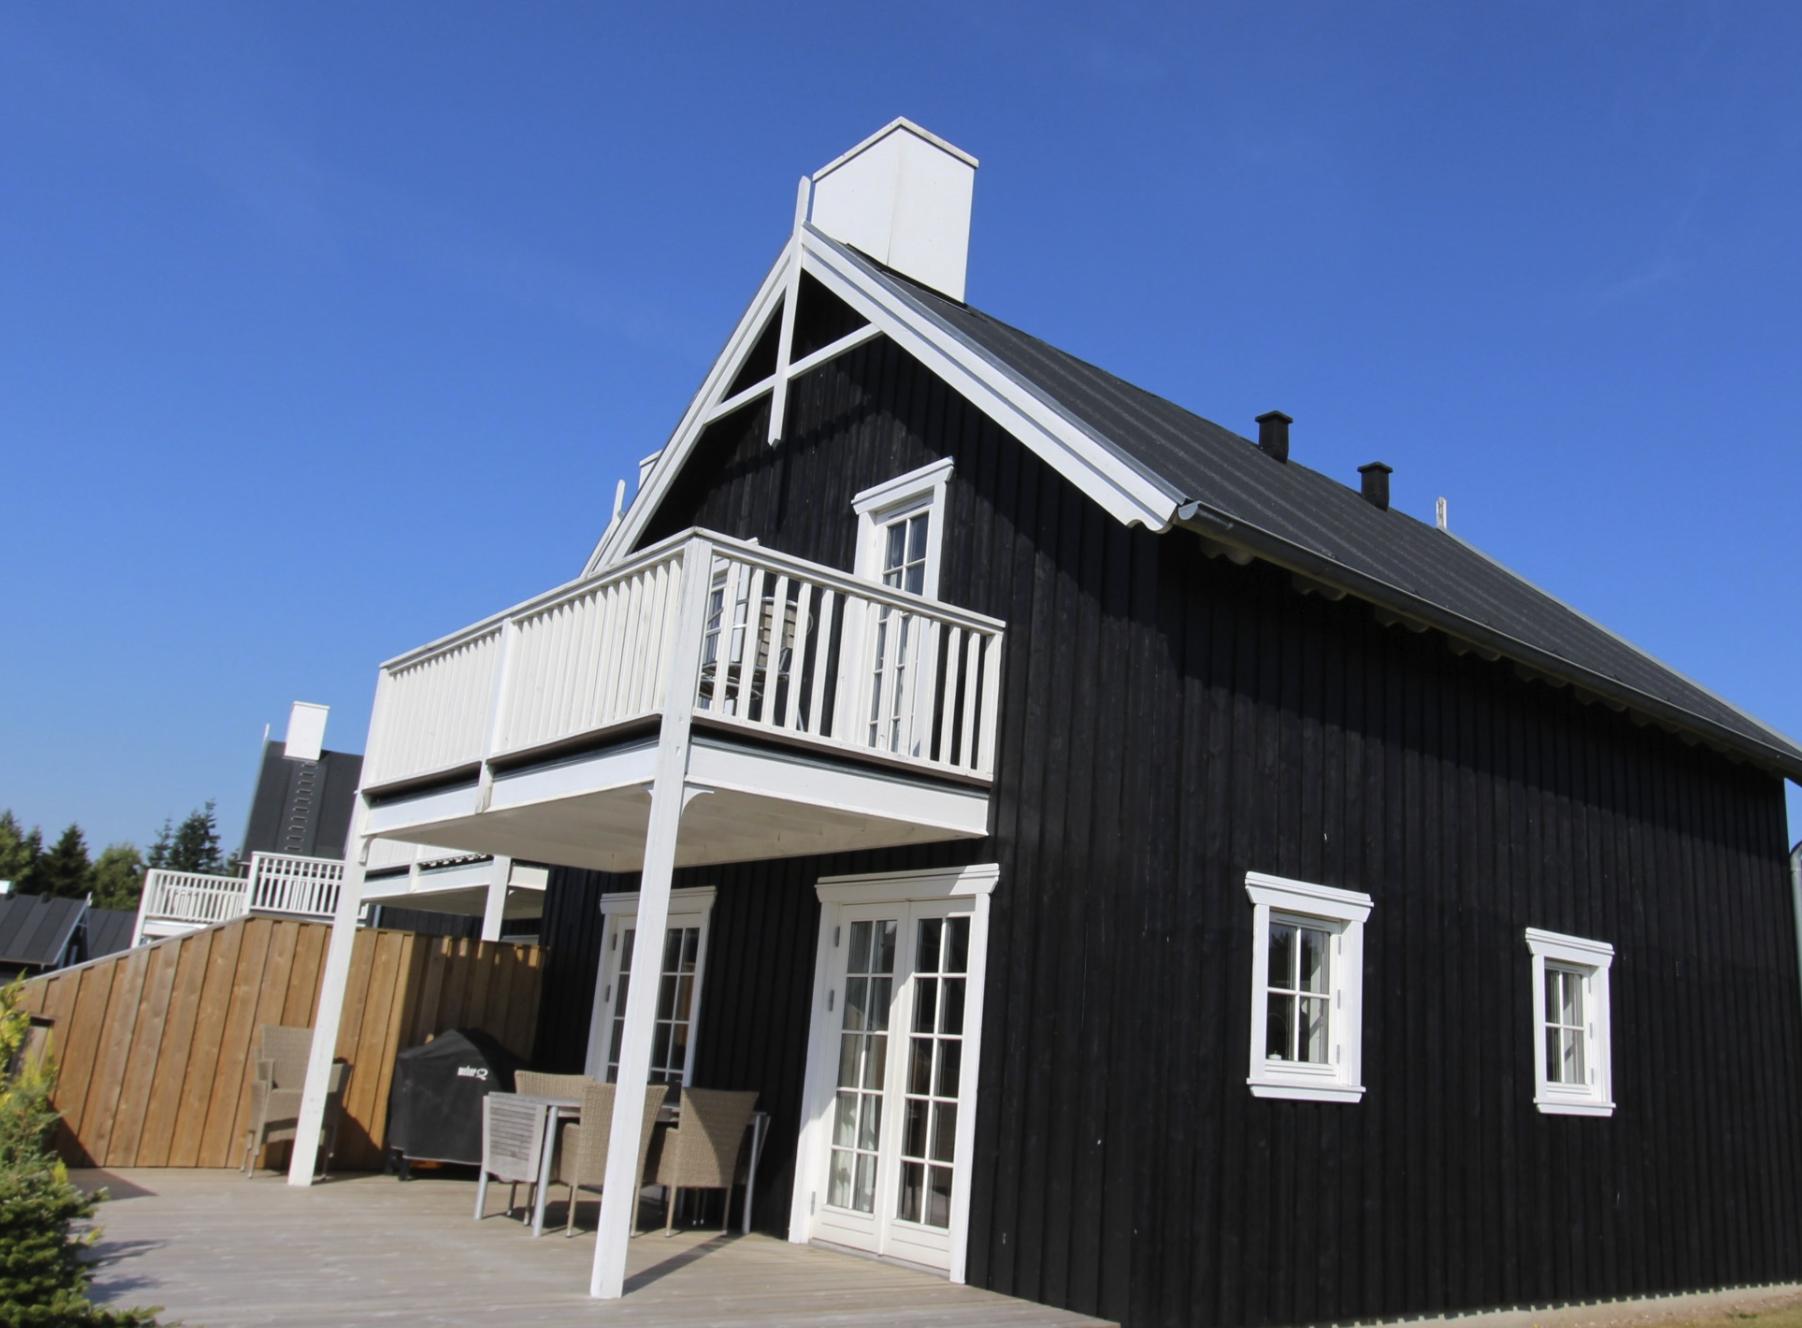 LejFeriehus.dk